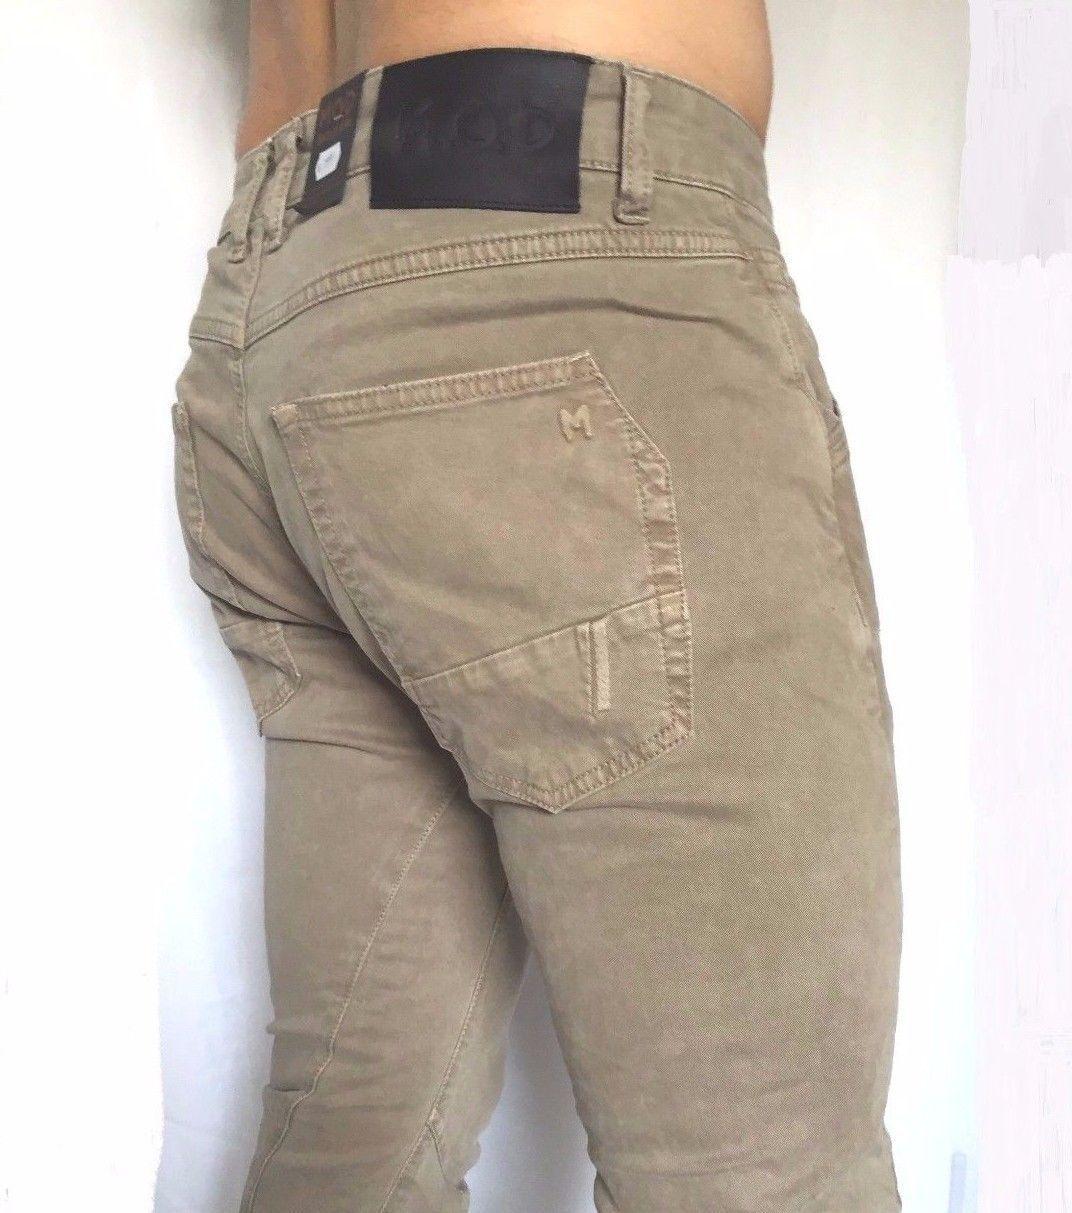 3ef7dd57 M.O.D Mod Men's Jeans Luke Slim Stretch Beige Sz. by 29 32 Bis 38 32 ...